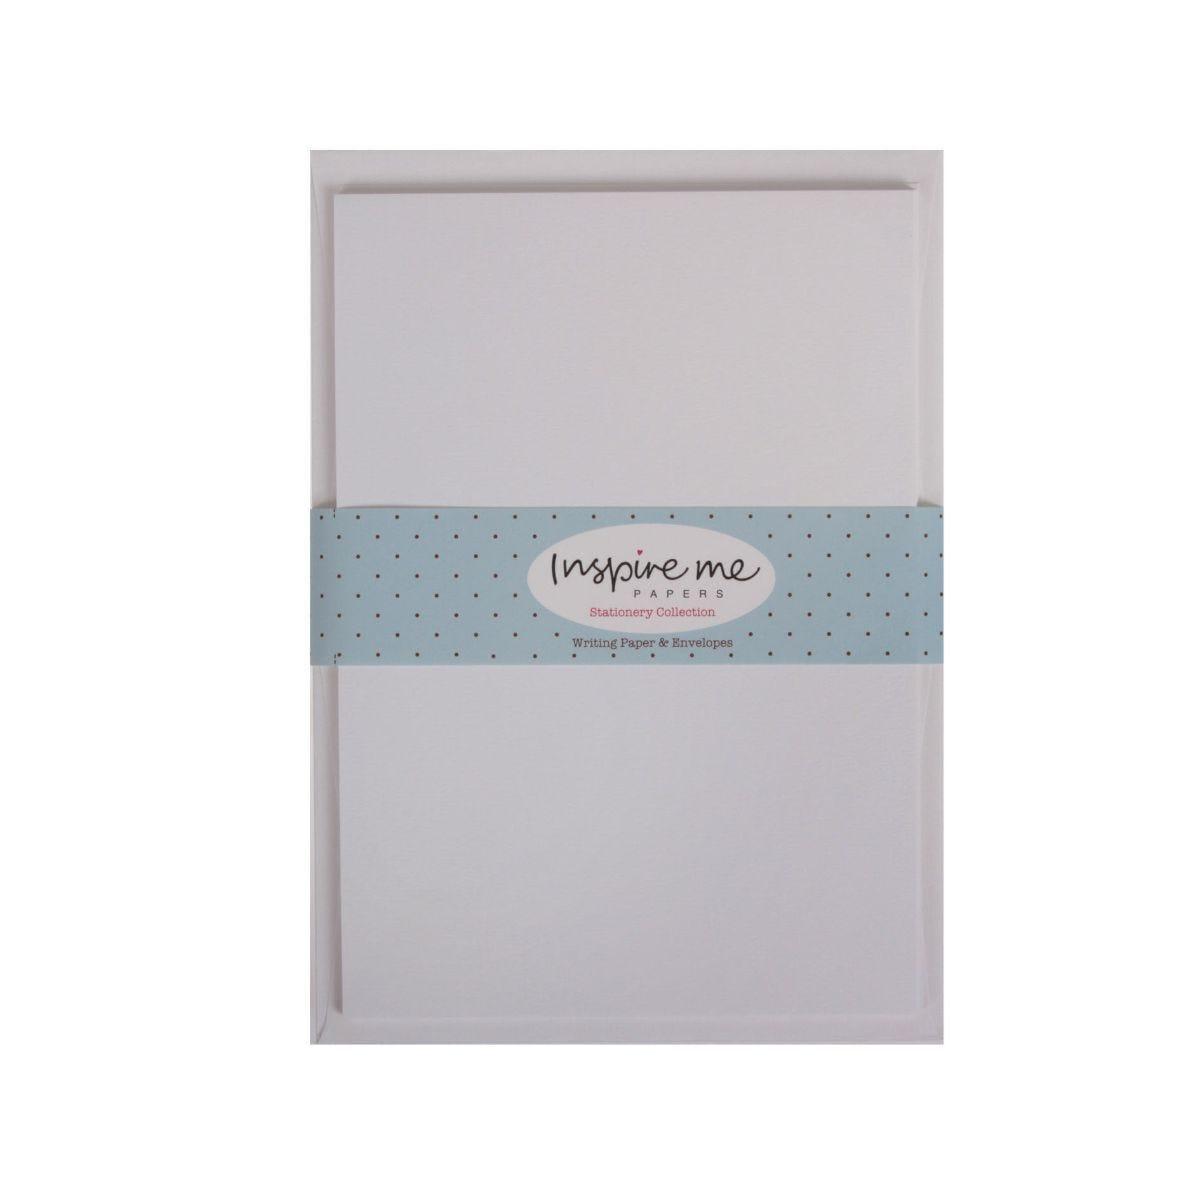 Inspire Me Writing Paper and Envelopes 20 Sheets 10 Envelopes White